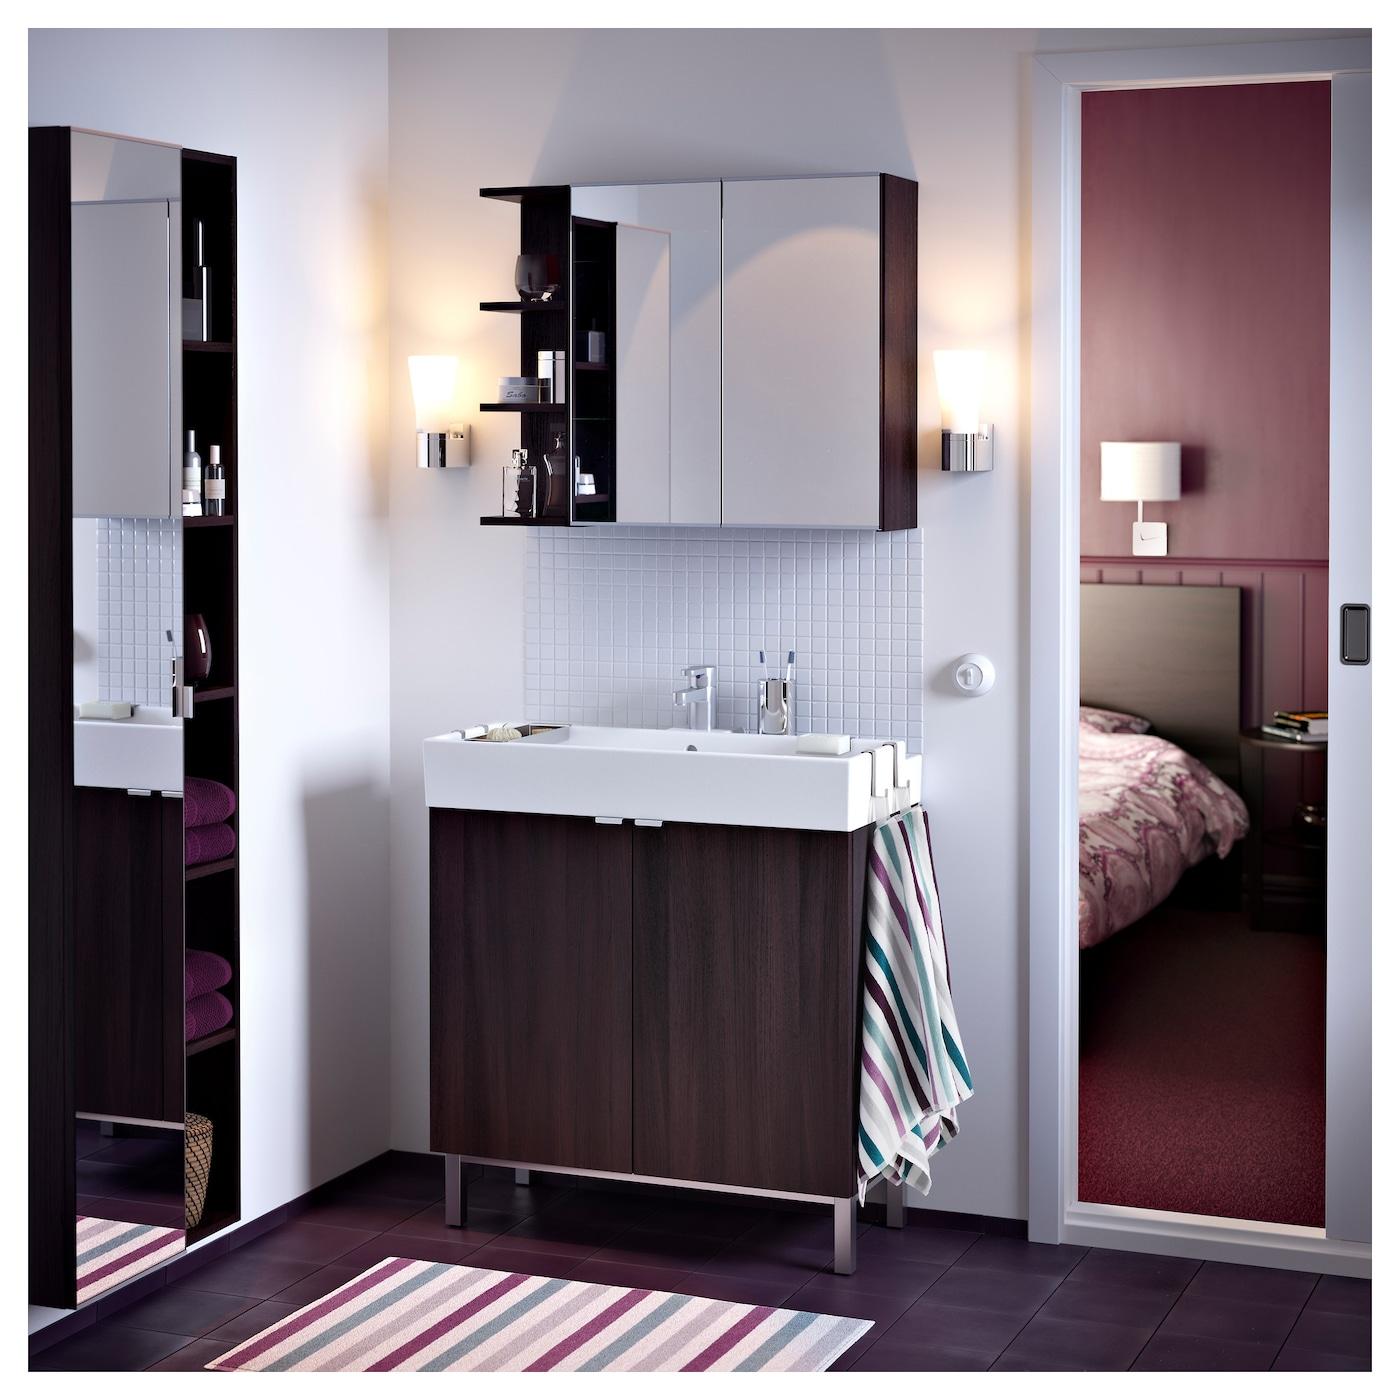 IKEA LILLNGEN Mirror Cabinet 2 Doors 1 End Unit